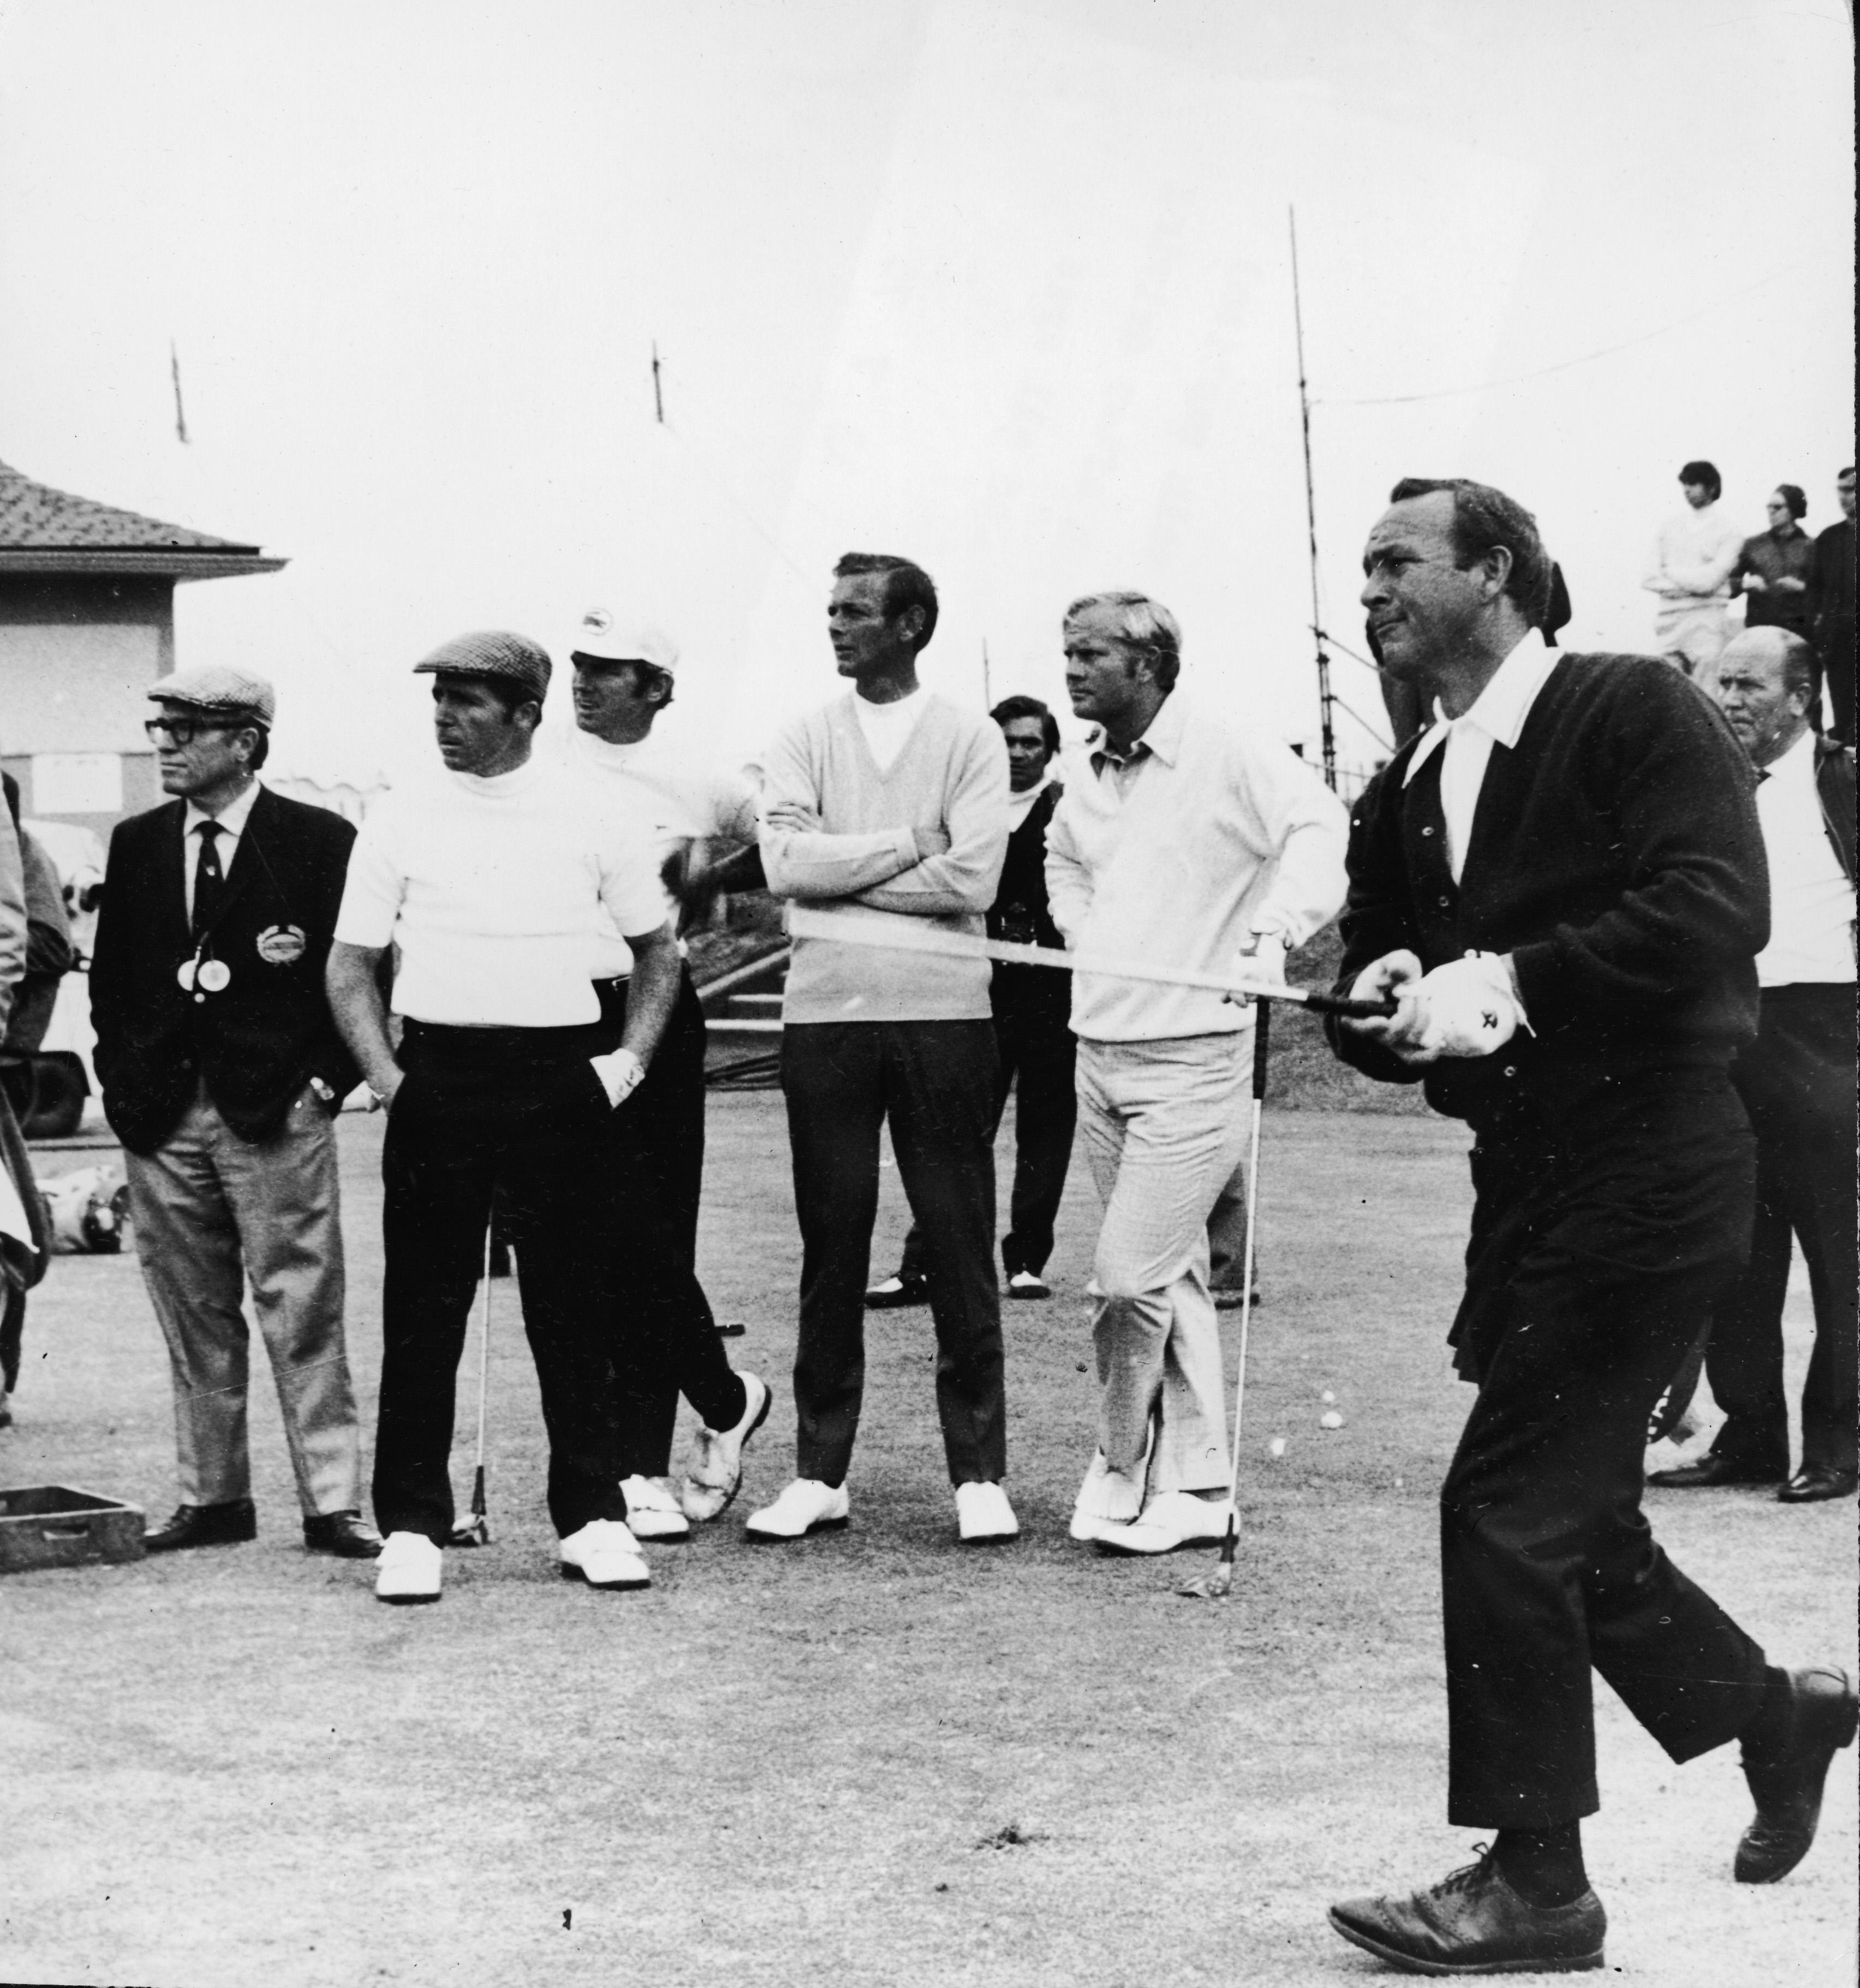 Golfing King Arnold Palmer dies aged 87: The legendary